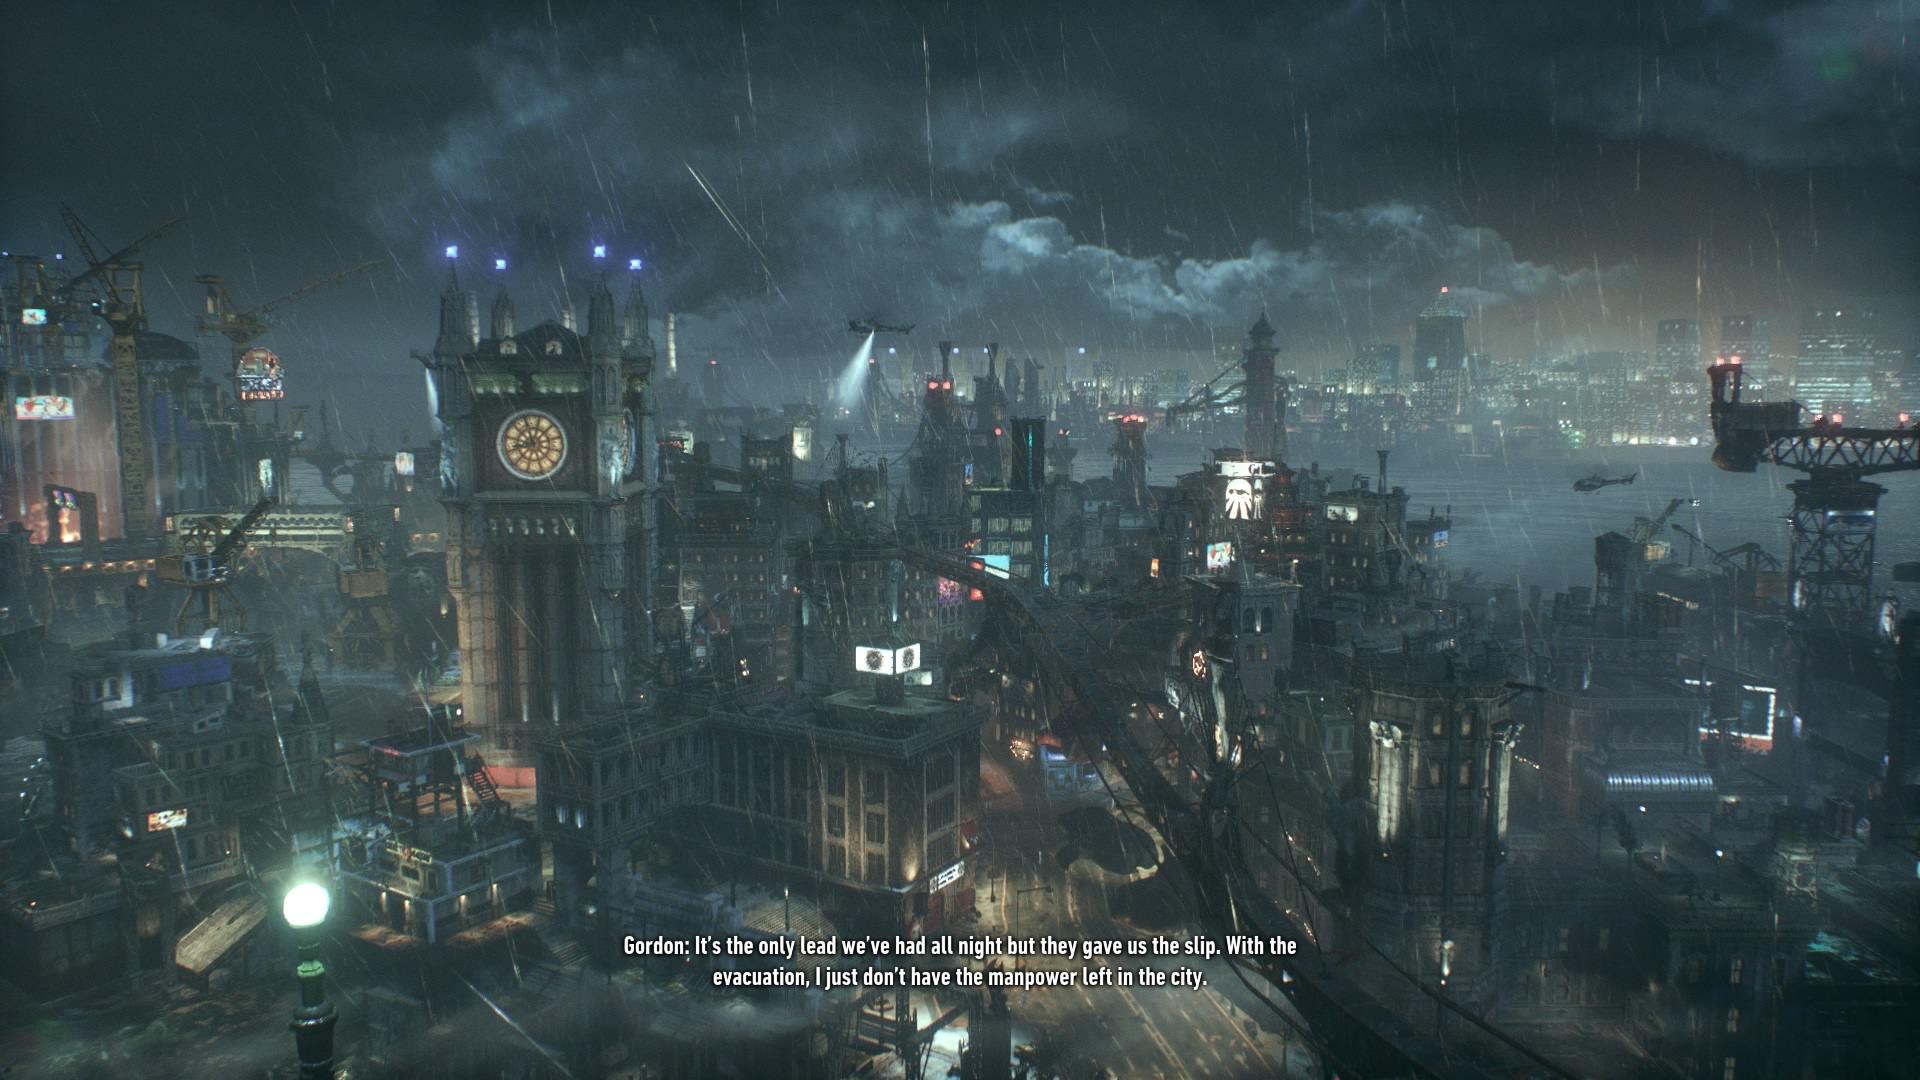 Recenze: Batman Arkham Knight – Strach nad Gothamem 10716